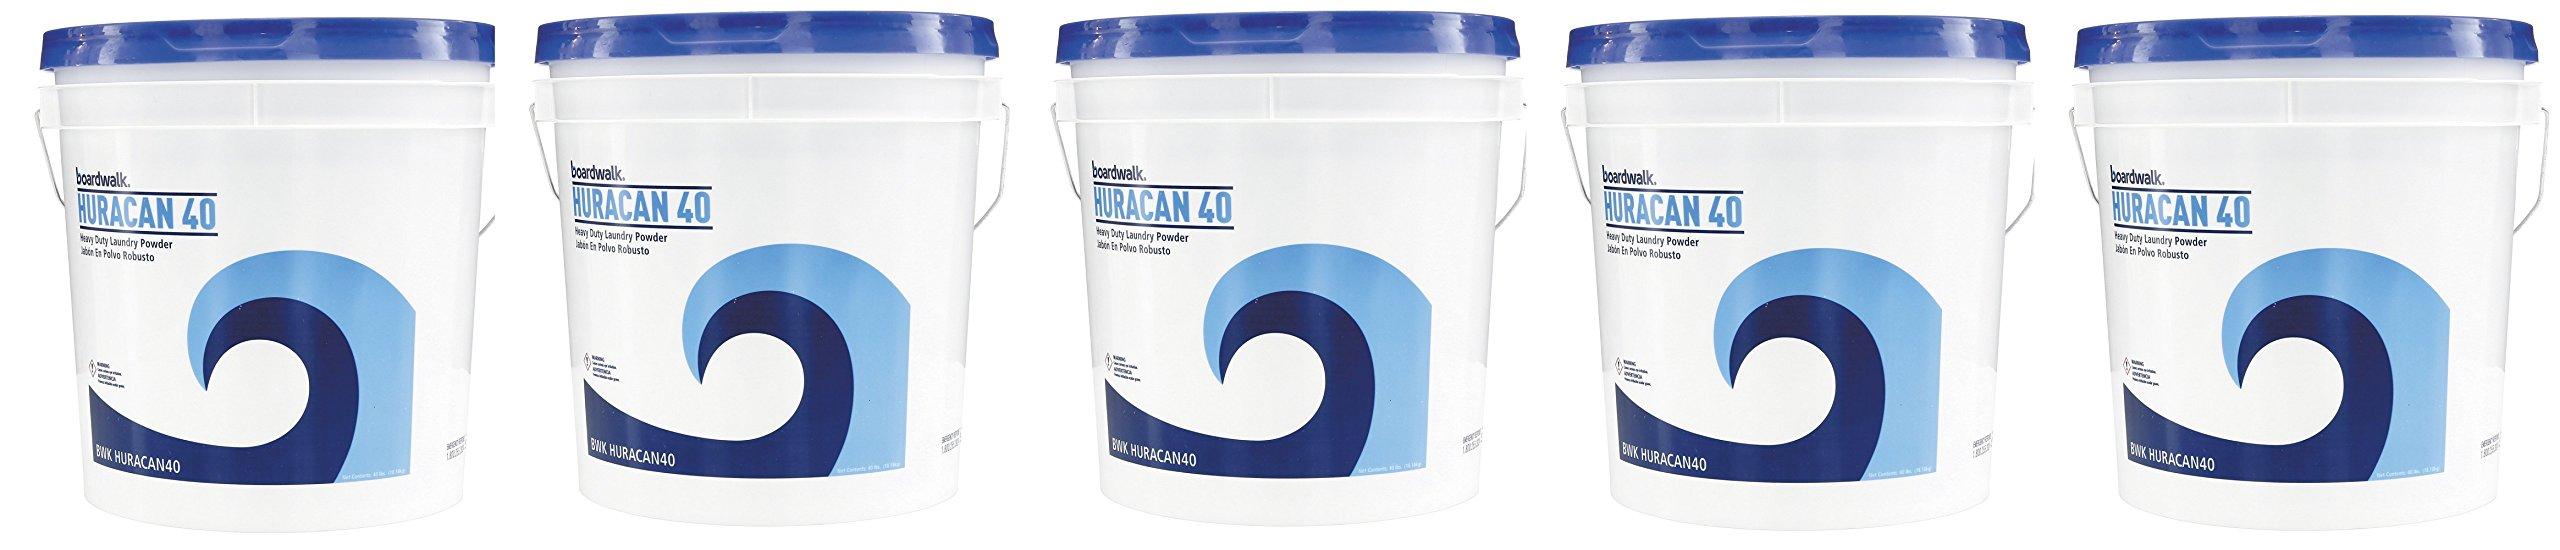 Boardwalk HURACAN40 Low Suds Laundry Detergent, Powder TGAUQs, 5 Pack (40lb.) by Boardwalk